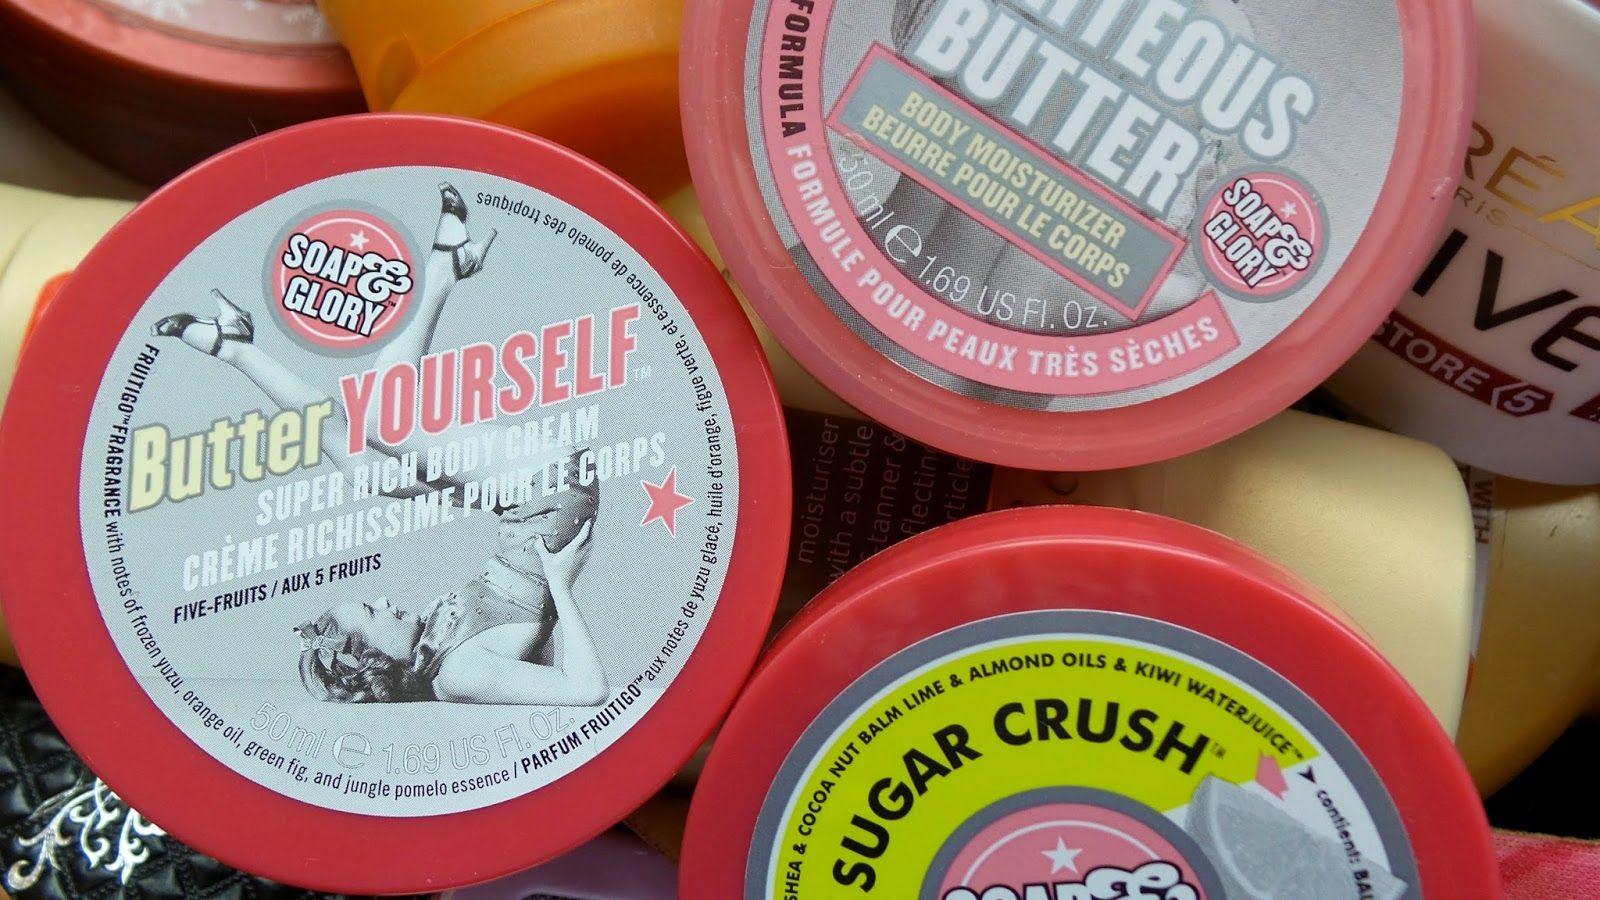 Eltoria Soap & Glory Body Butters Body butter, Body